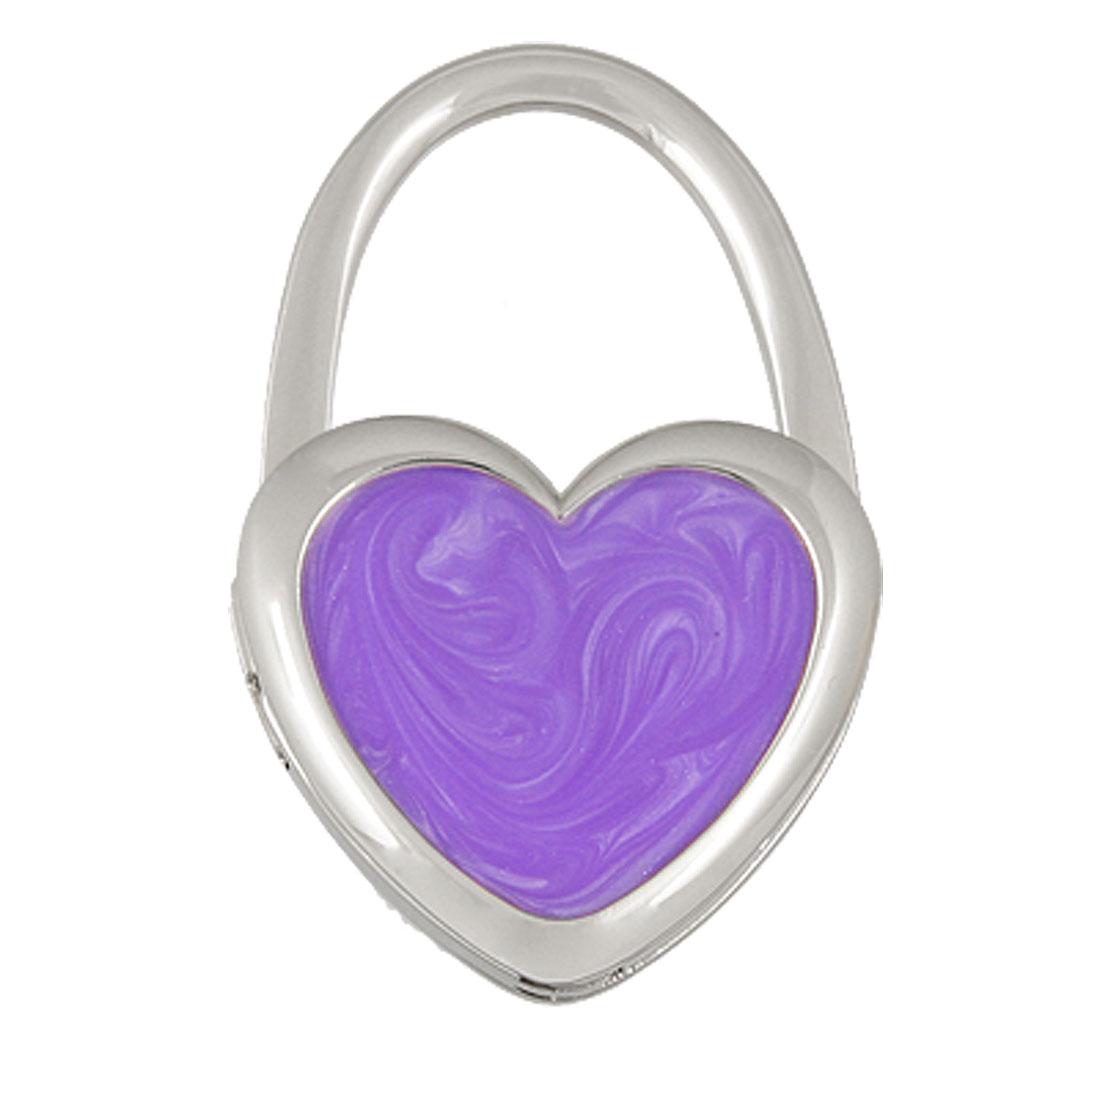 Heart Shaped Padlock Style Purple Silver Tone Table Hanger